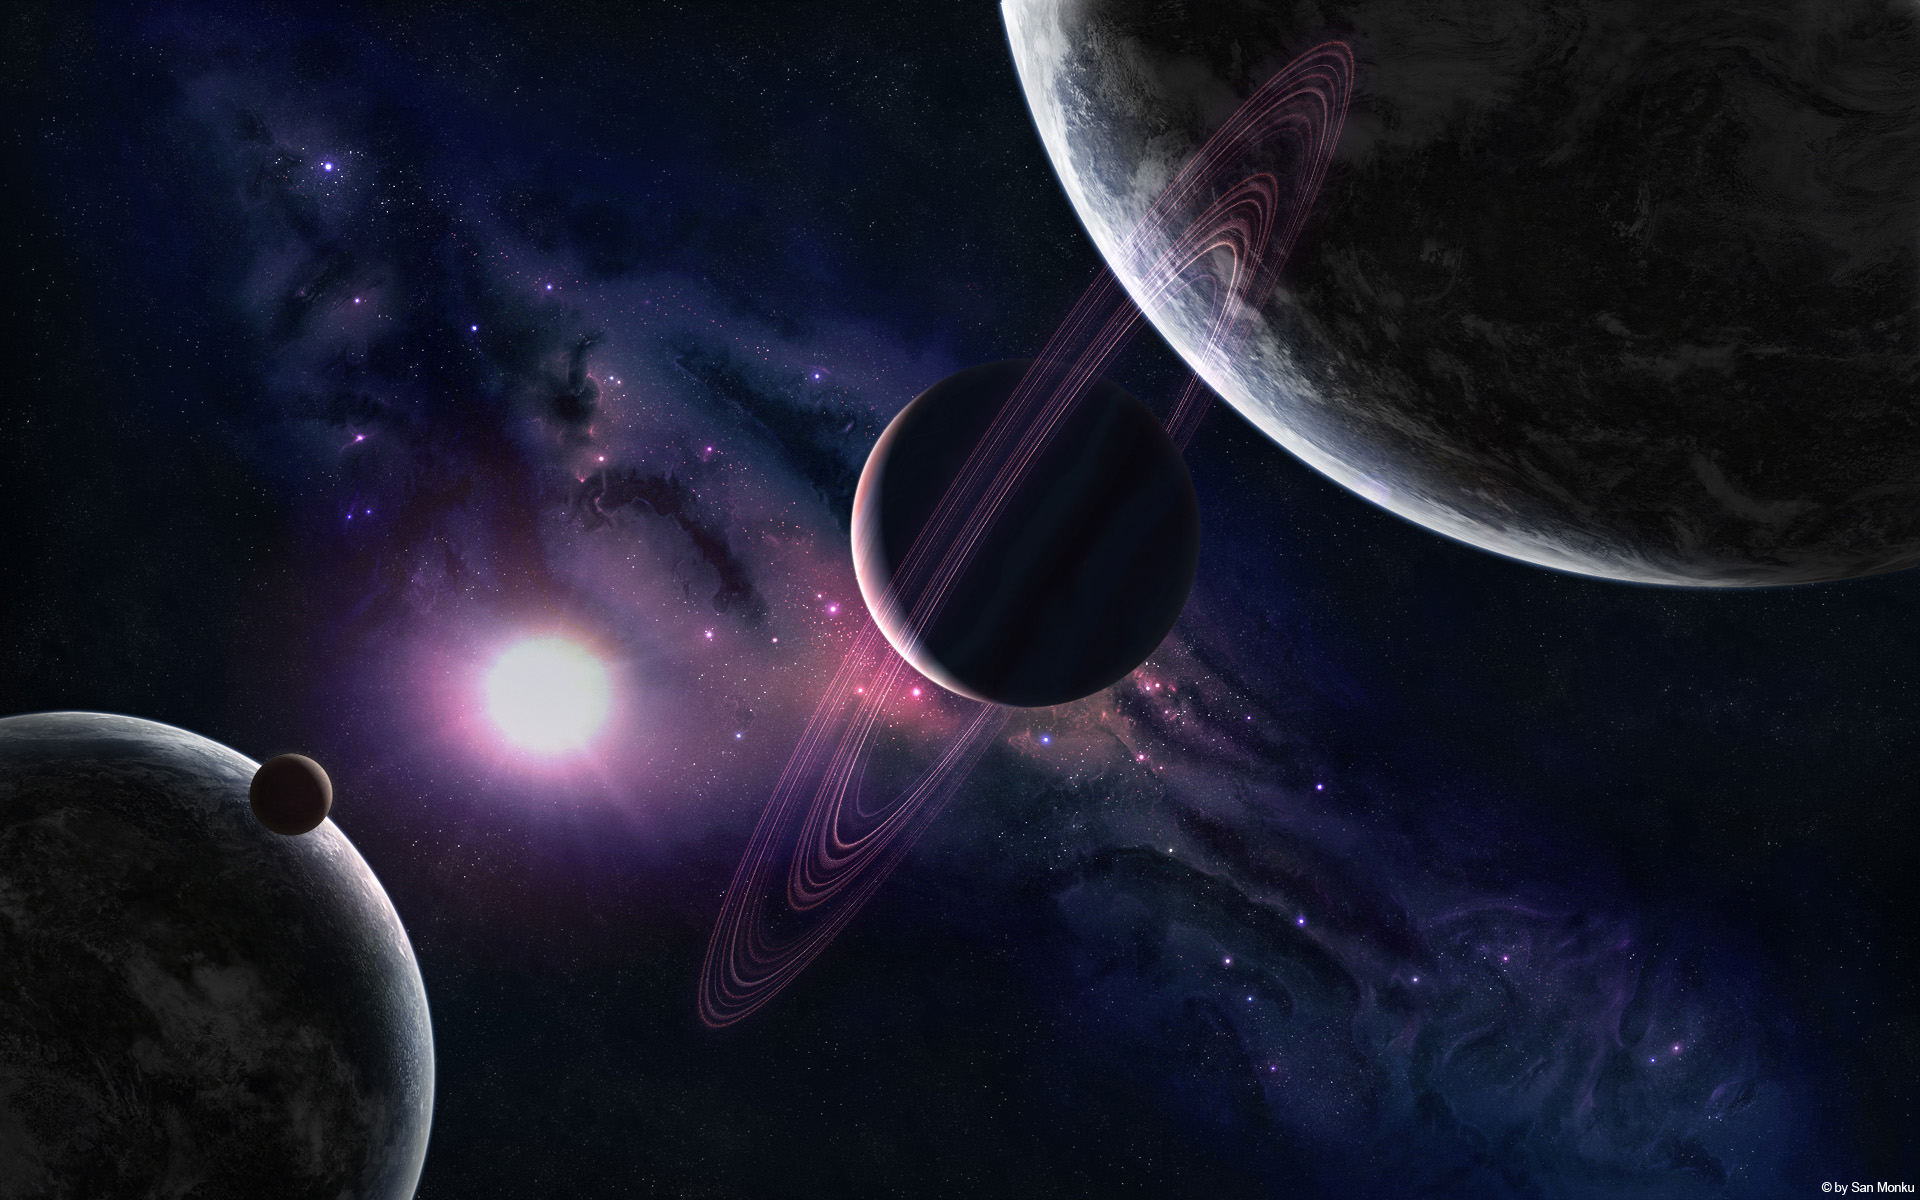 planet x nasa report Bursts desktop permission thanks planet x 1920x1200